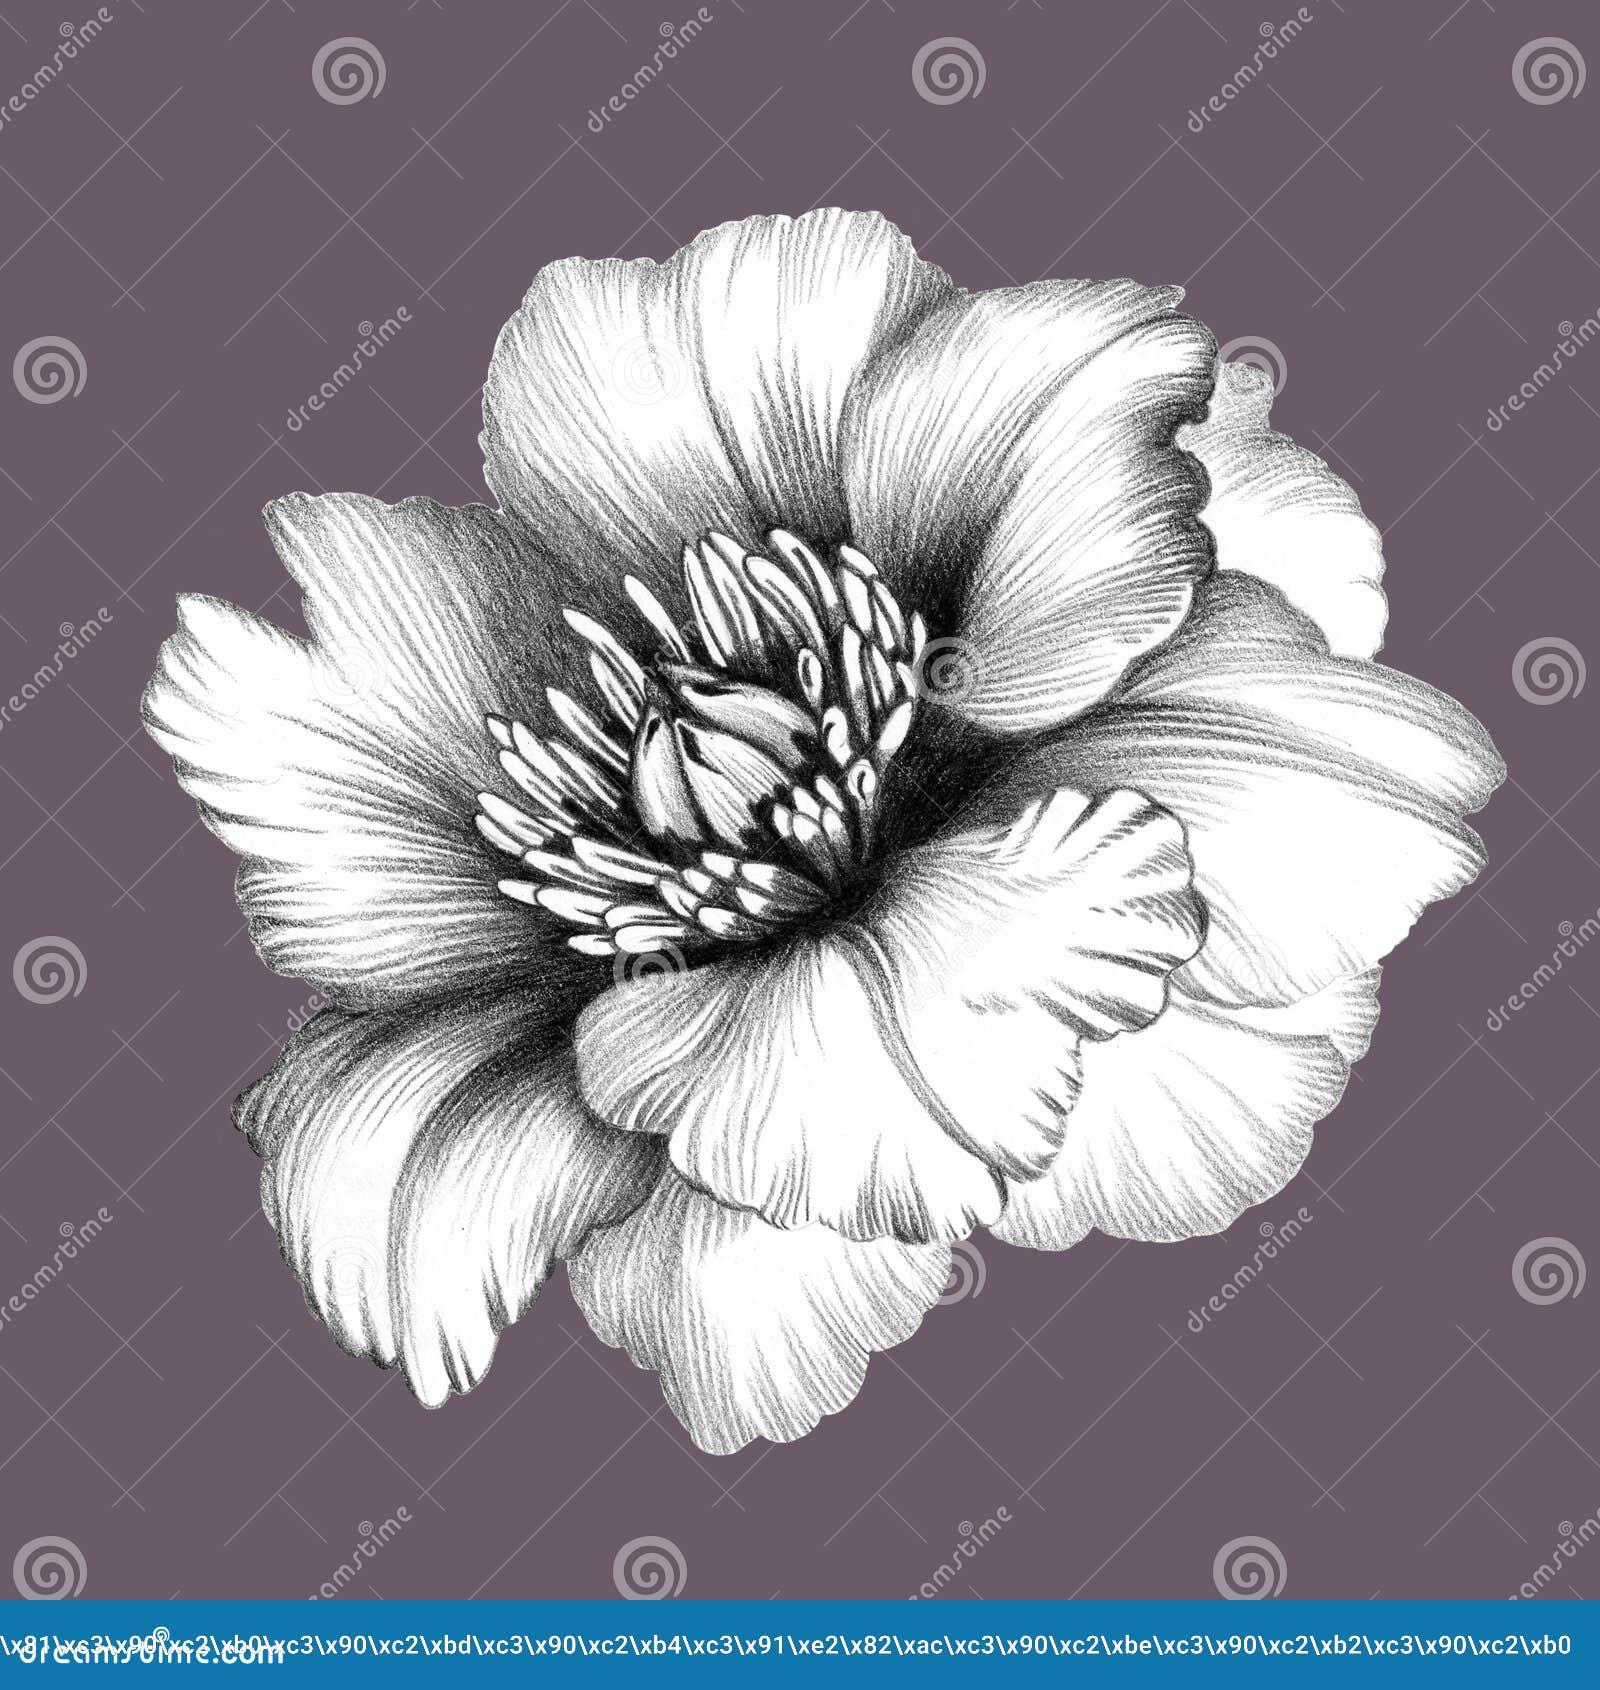 Peonies Fleur Dessin Au Crayon Illustration Stock Image 60806940